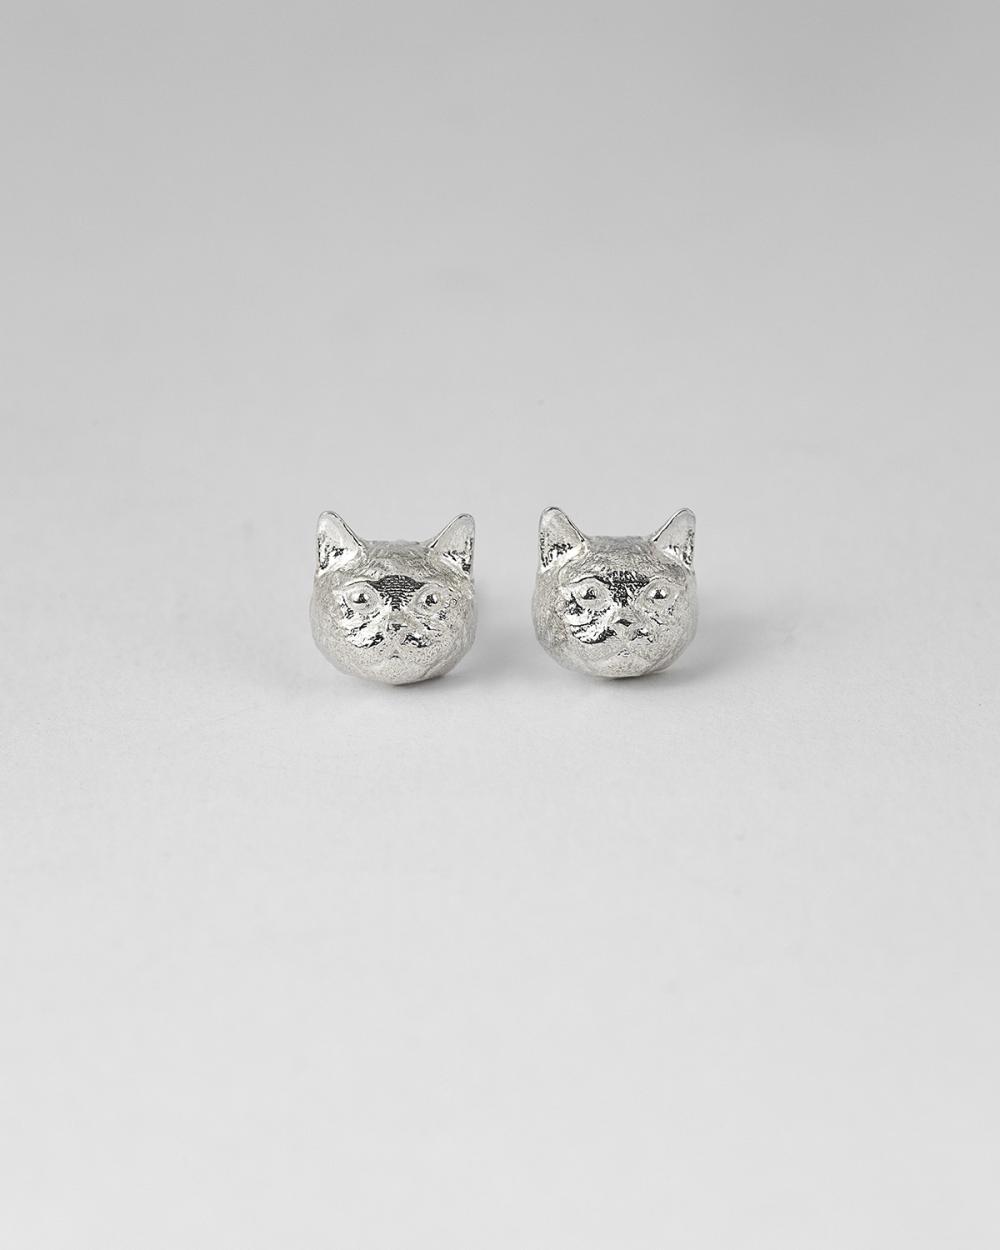 british haircut couple earrings polished finish